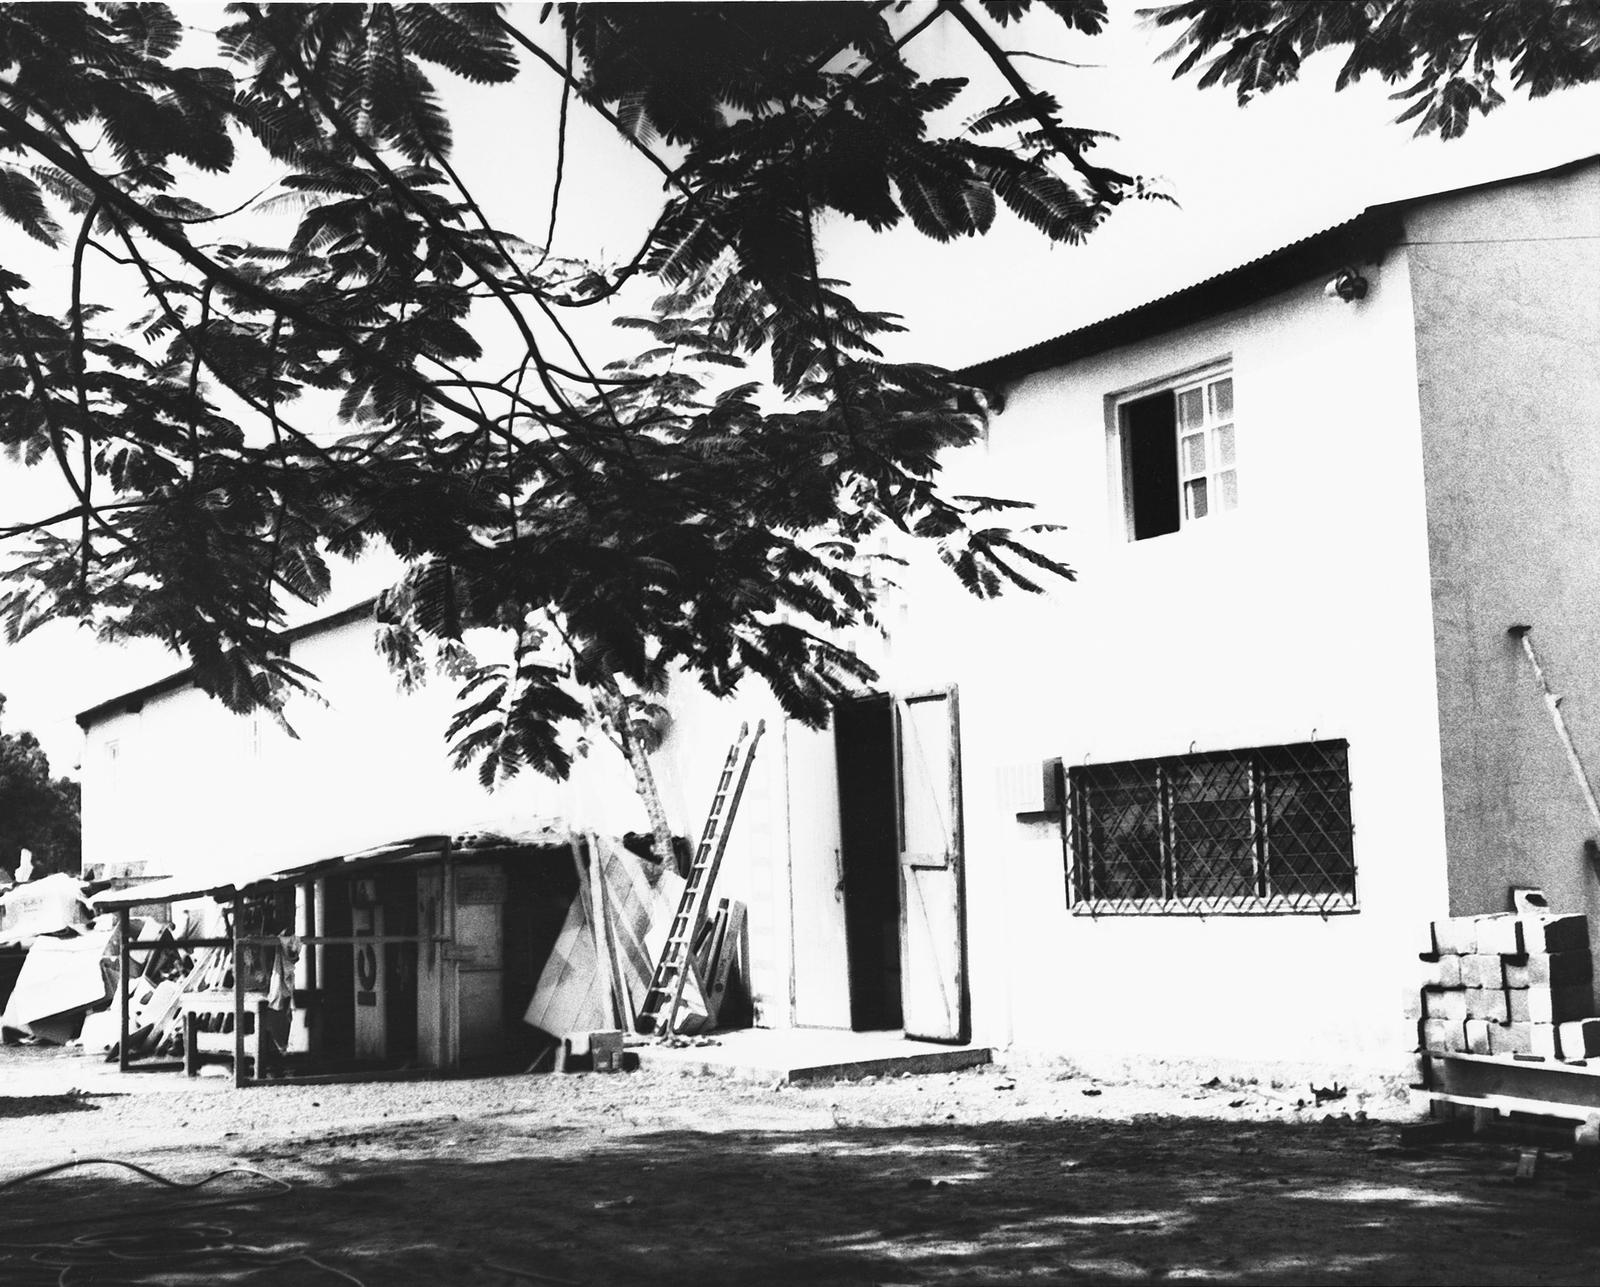 Brazzaville - Warehouse